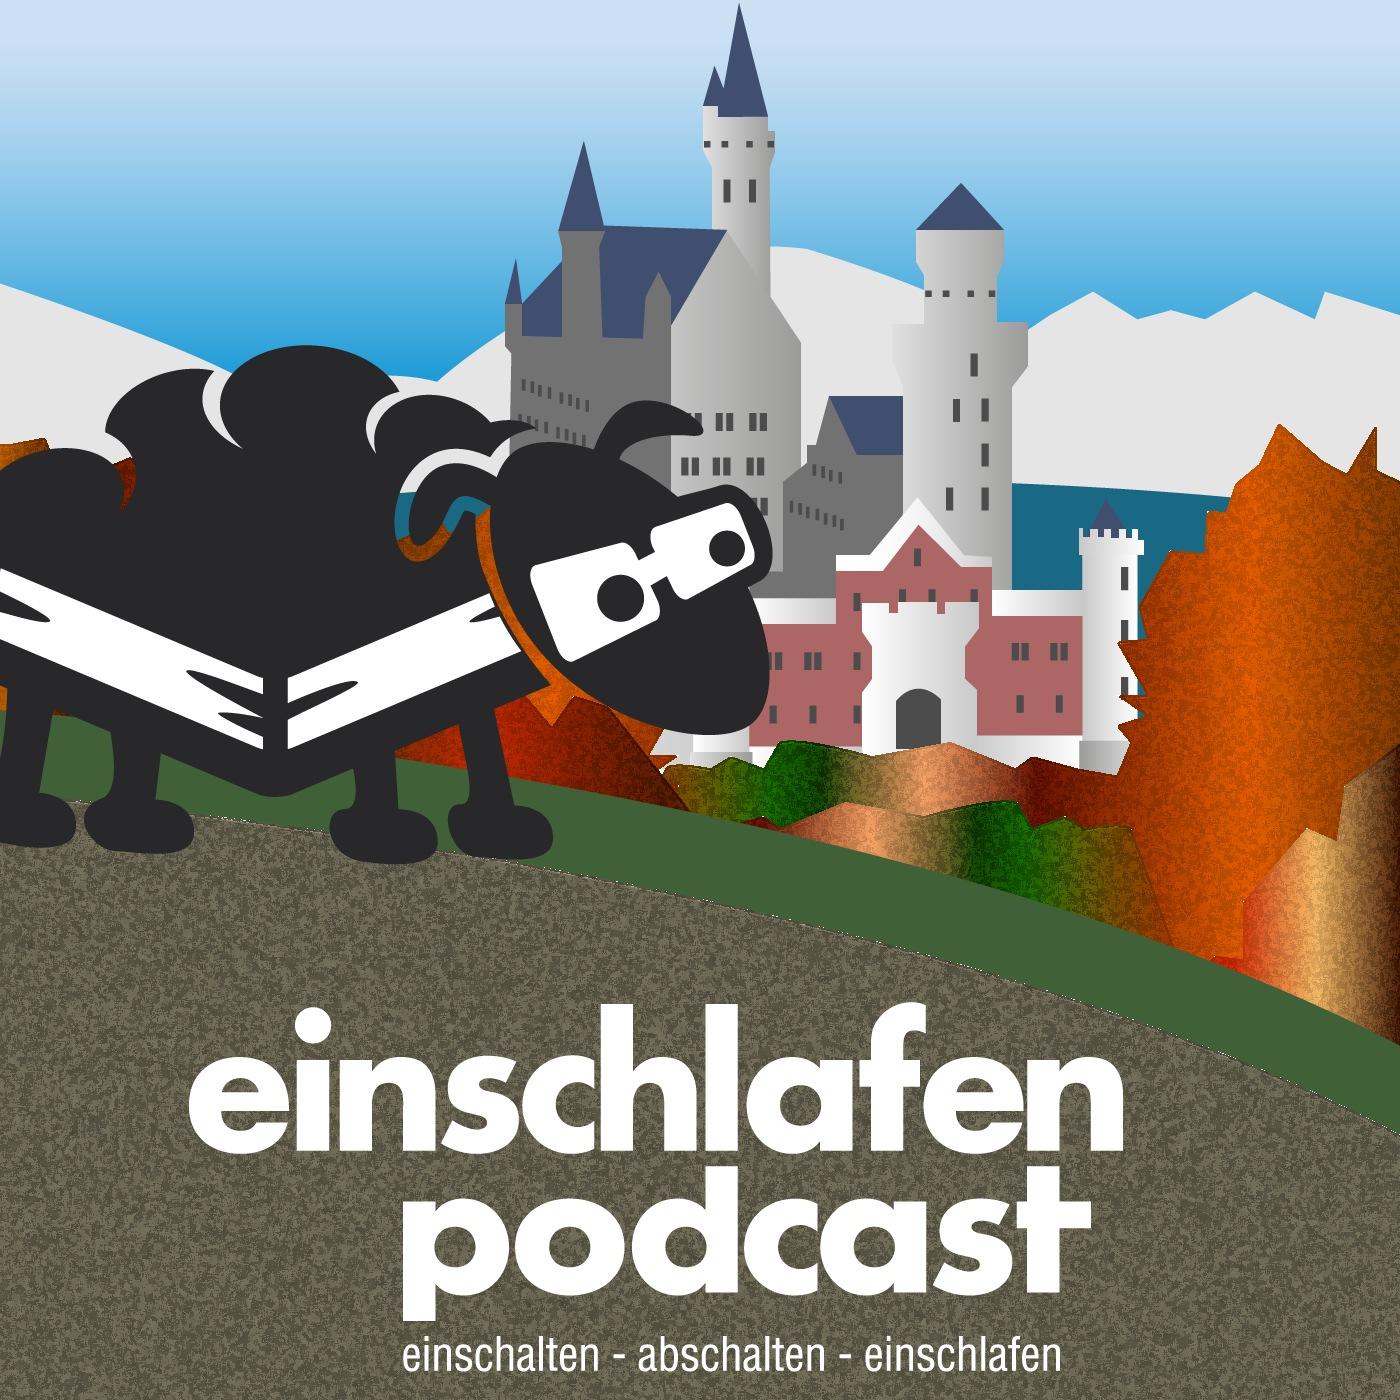 EP 309 - Brüdertournee und Immanuel Kant - Episodenbild